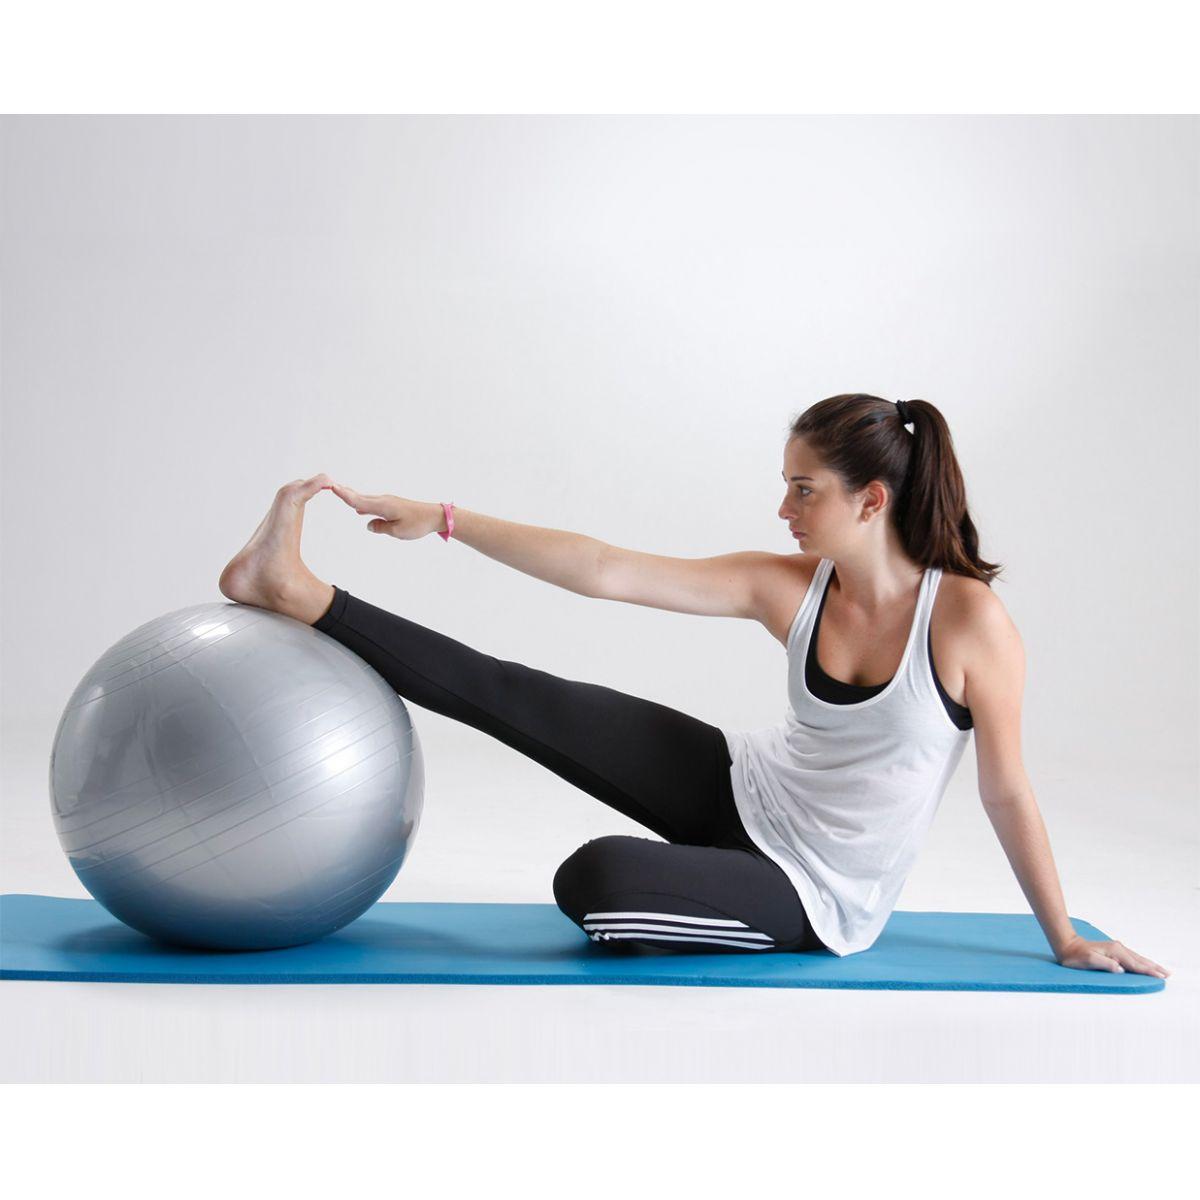 Bola suíça para pilates 65cm Gynastic Ball - cinza - BL.01.65